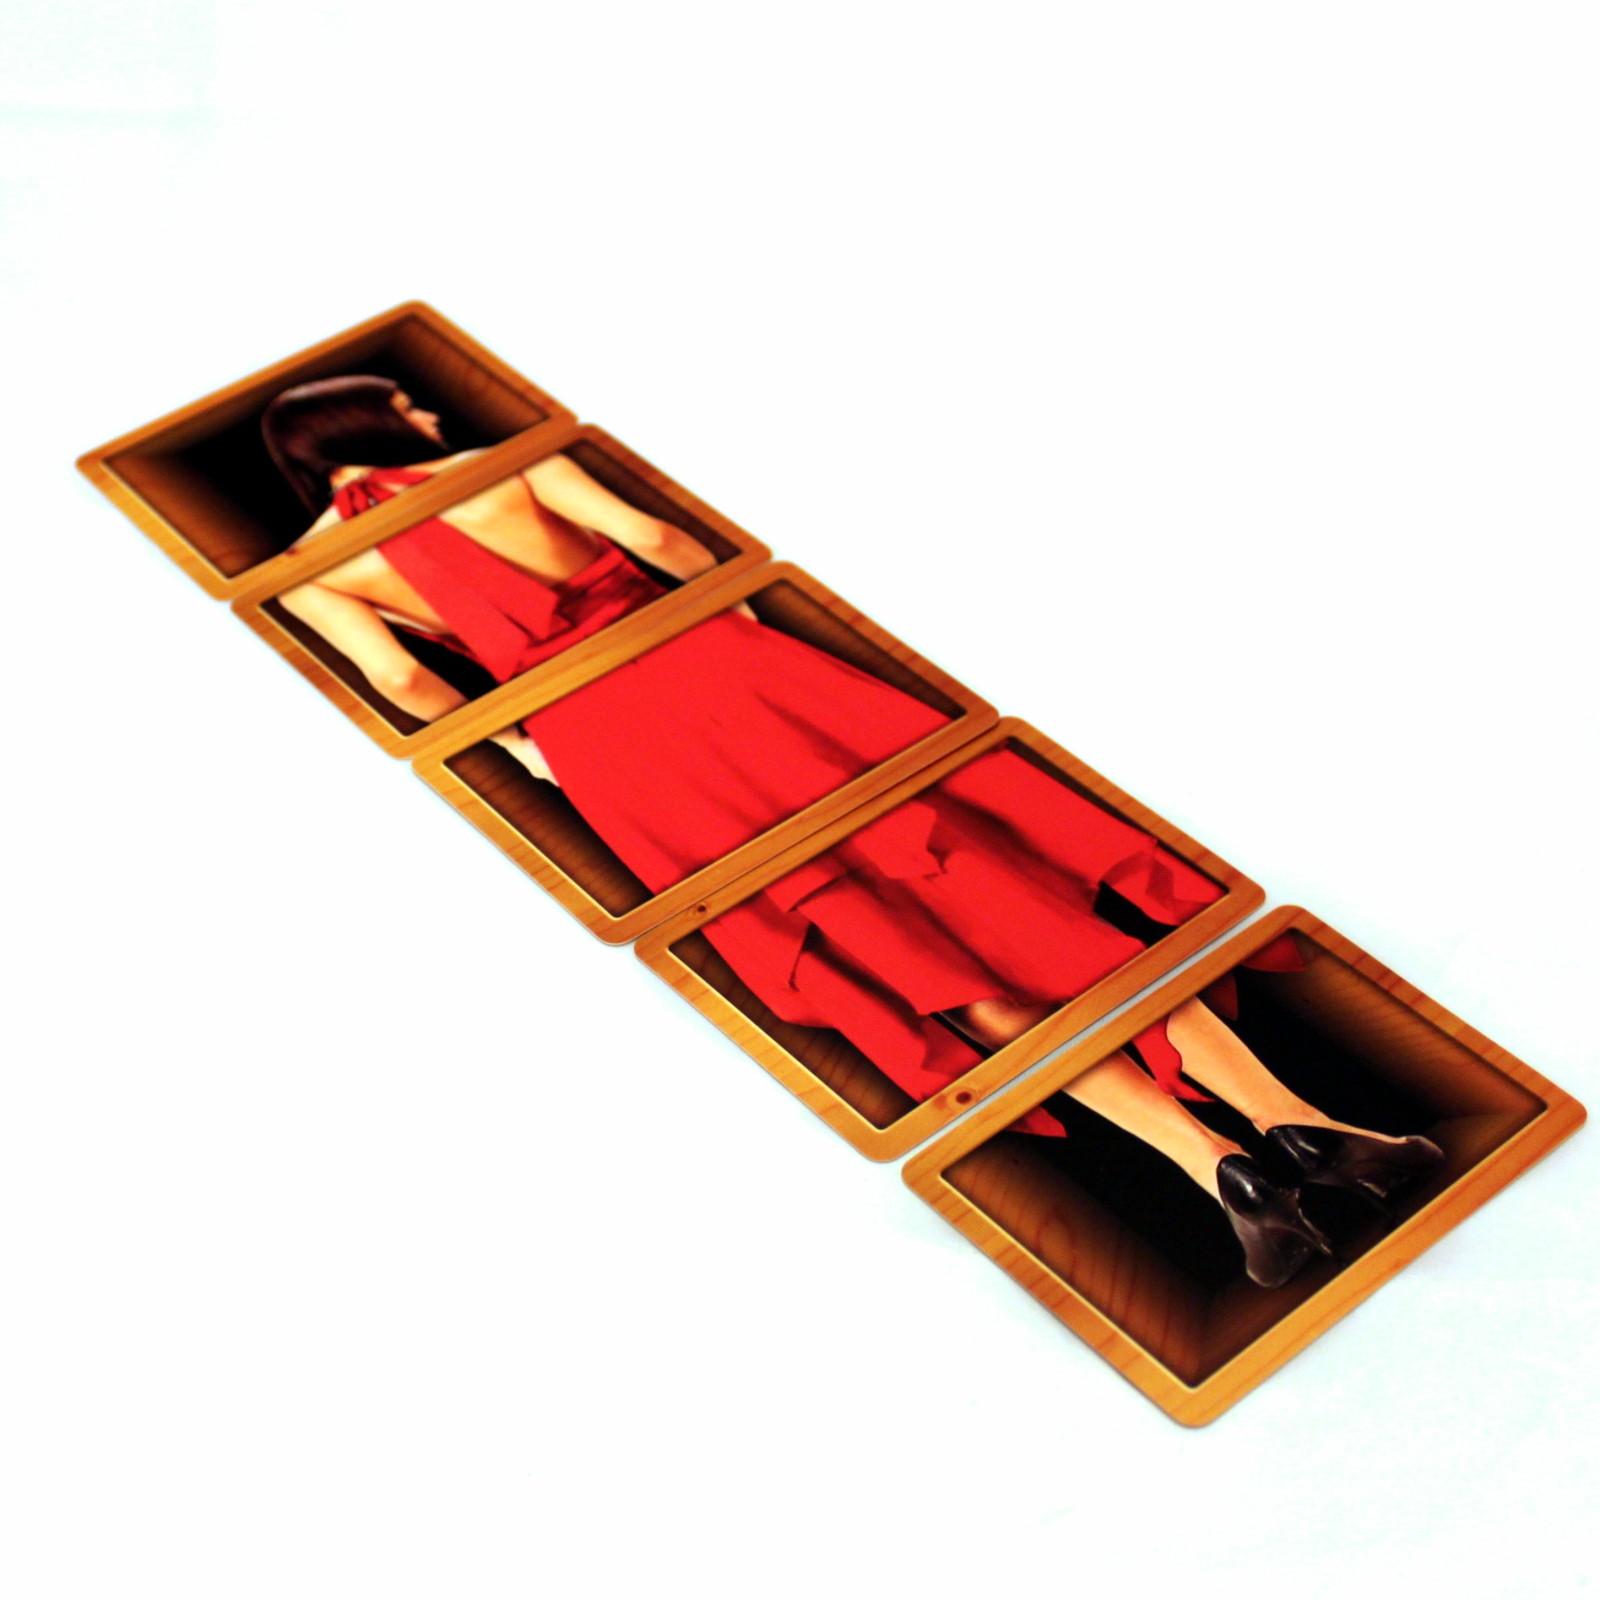 Pocket Illusion by Astor